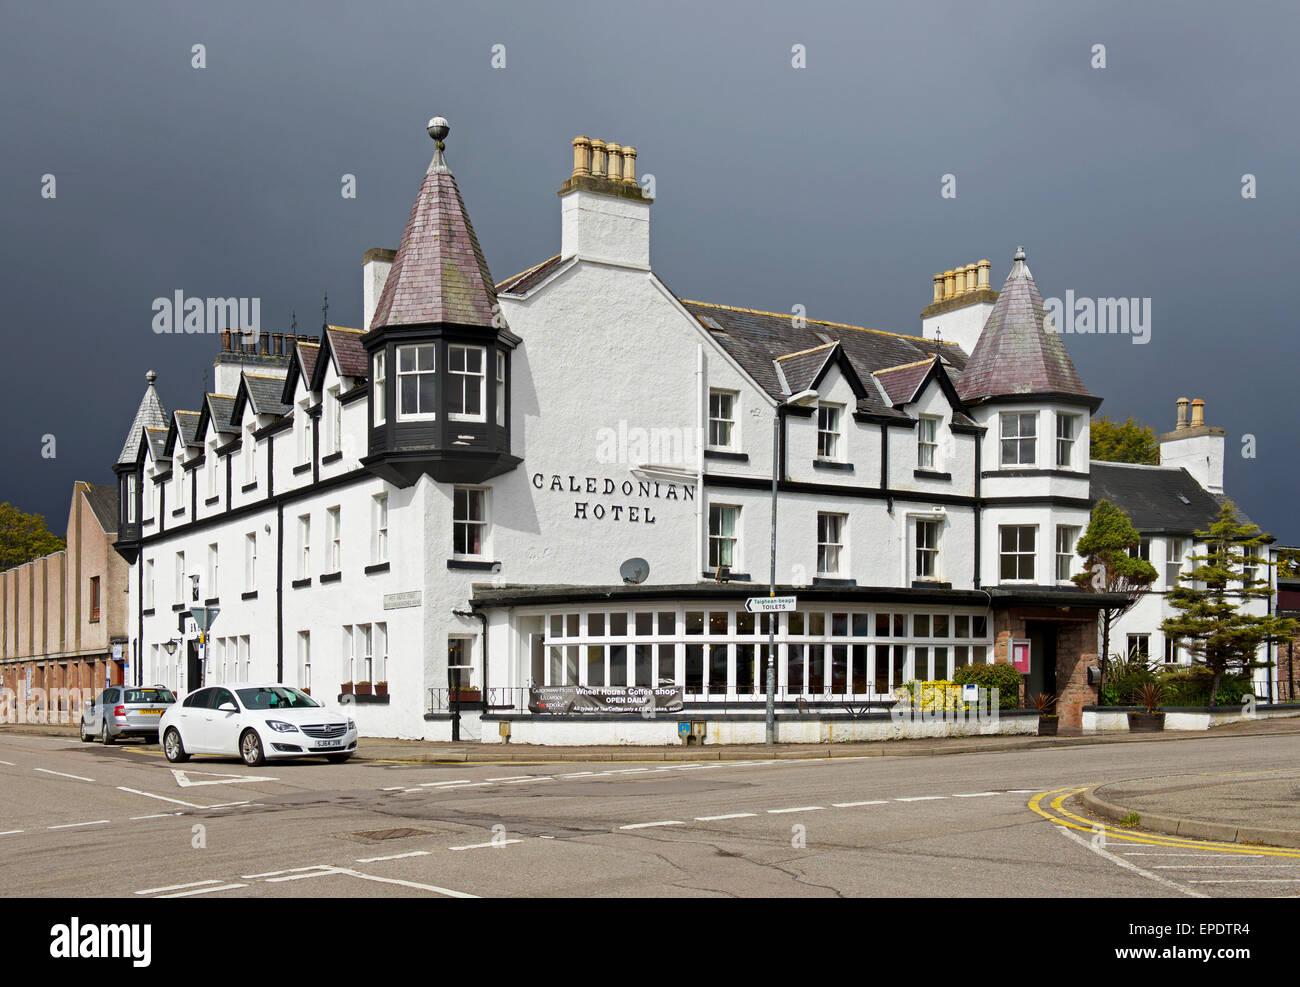 The caledonia hotel ullapool ross shire scotland uk for The caledonia